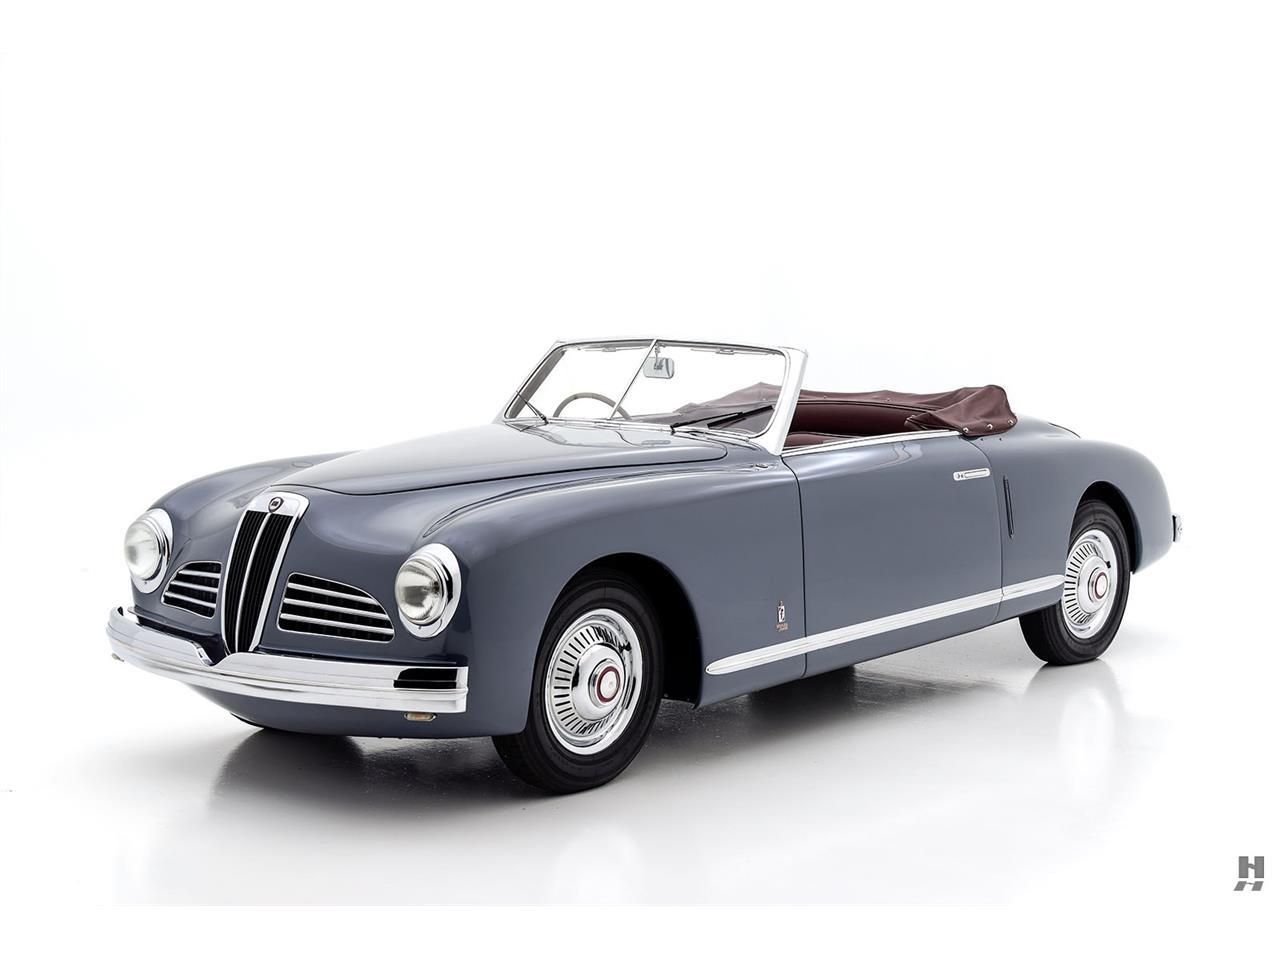 1946 Lancia Aprilia (CC-1105208) for sale in Saint Louis, Missouri